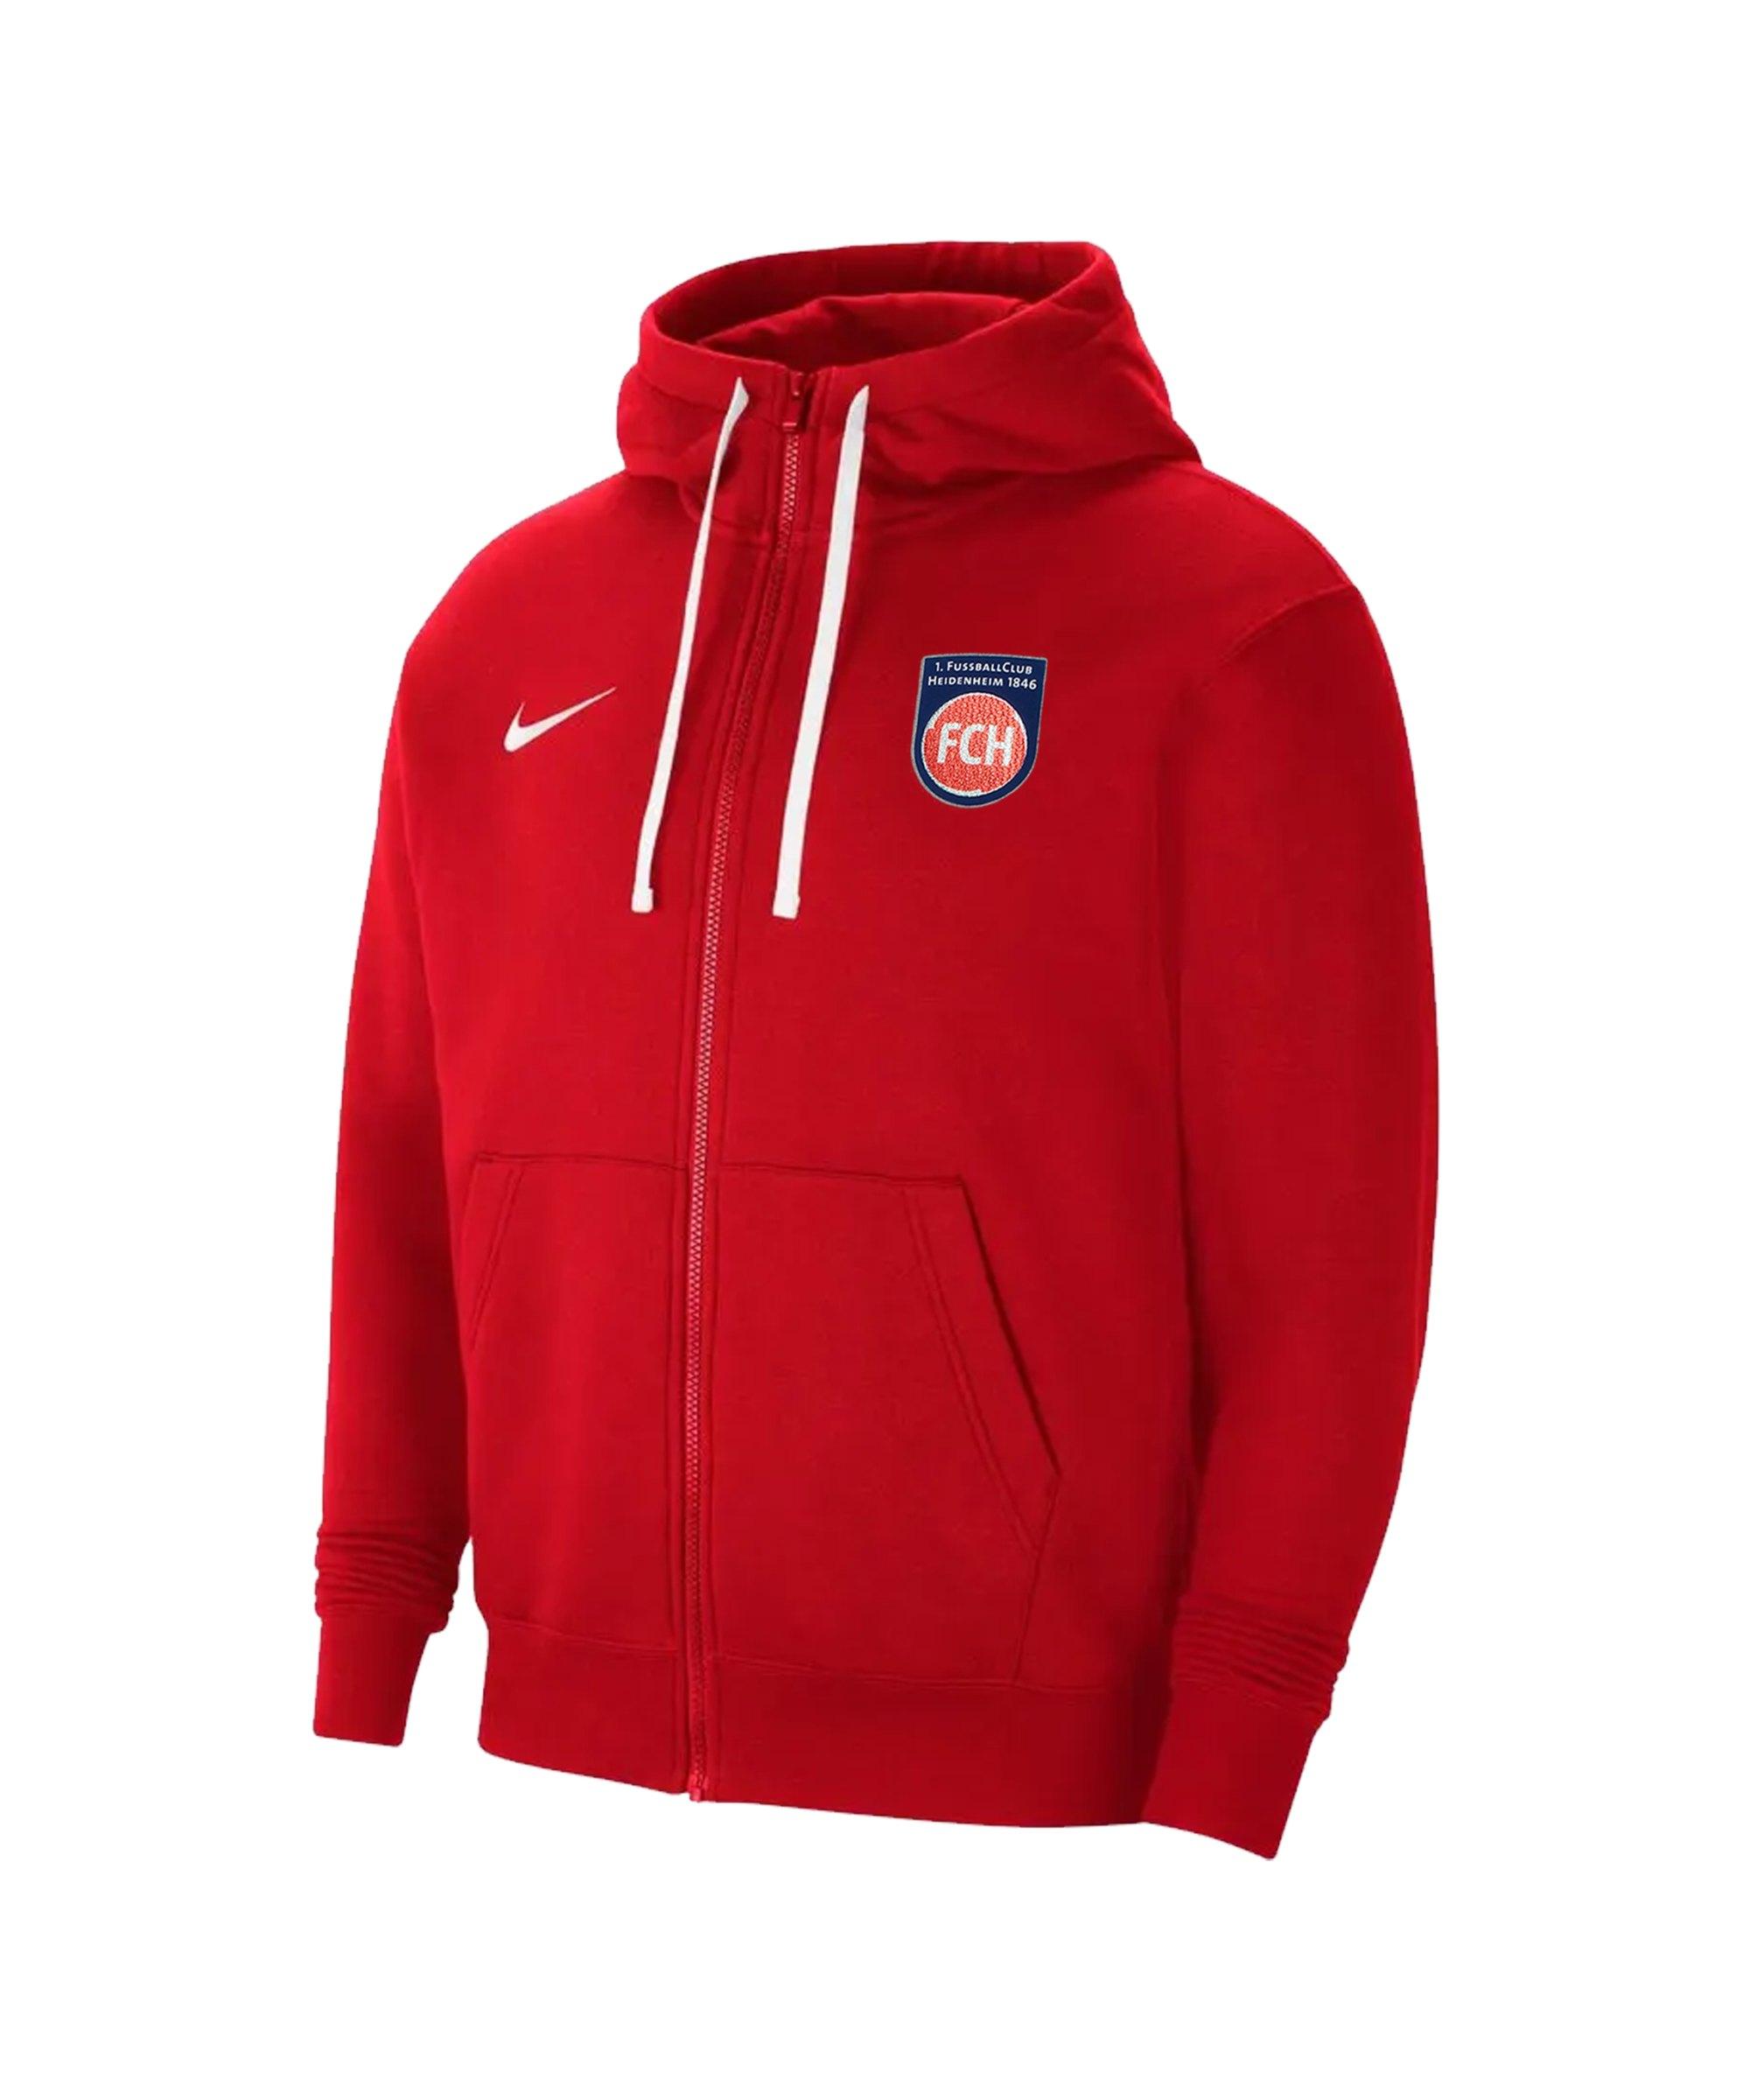 Nike 1. FC Heidenheim Kapuzenjacke Kids Rot F657 - rot